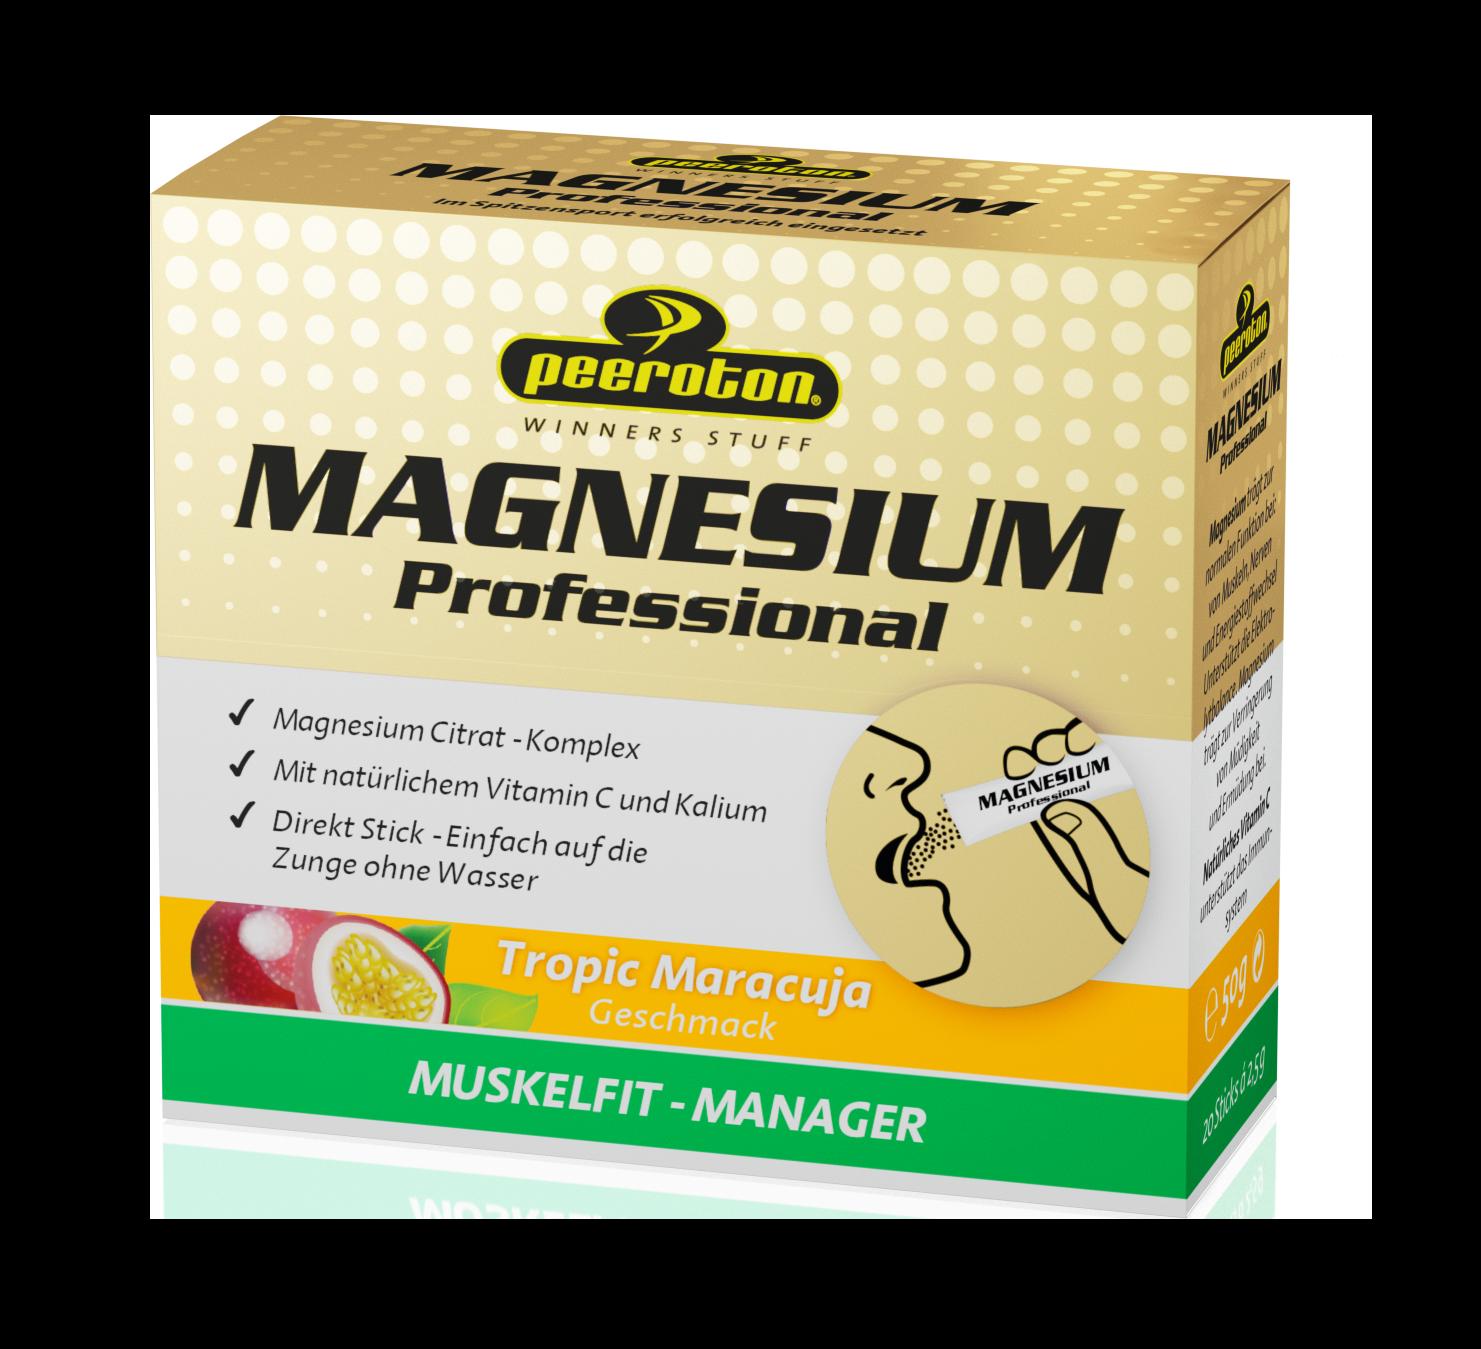 Peeroton Magnesium Sticks Tropic Maracuja // 20 Sticks